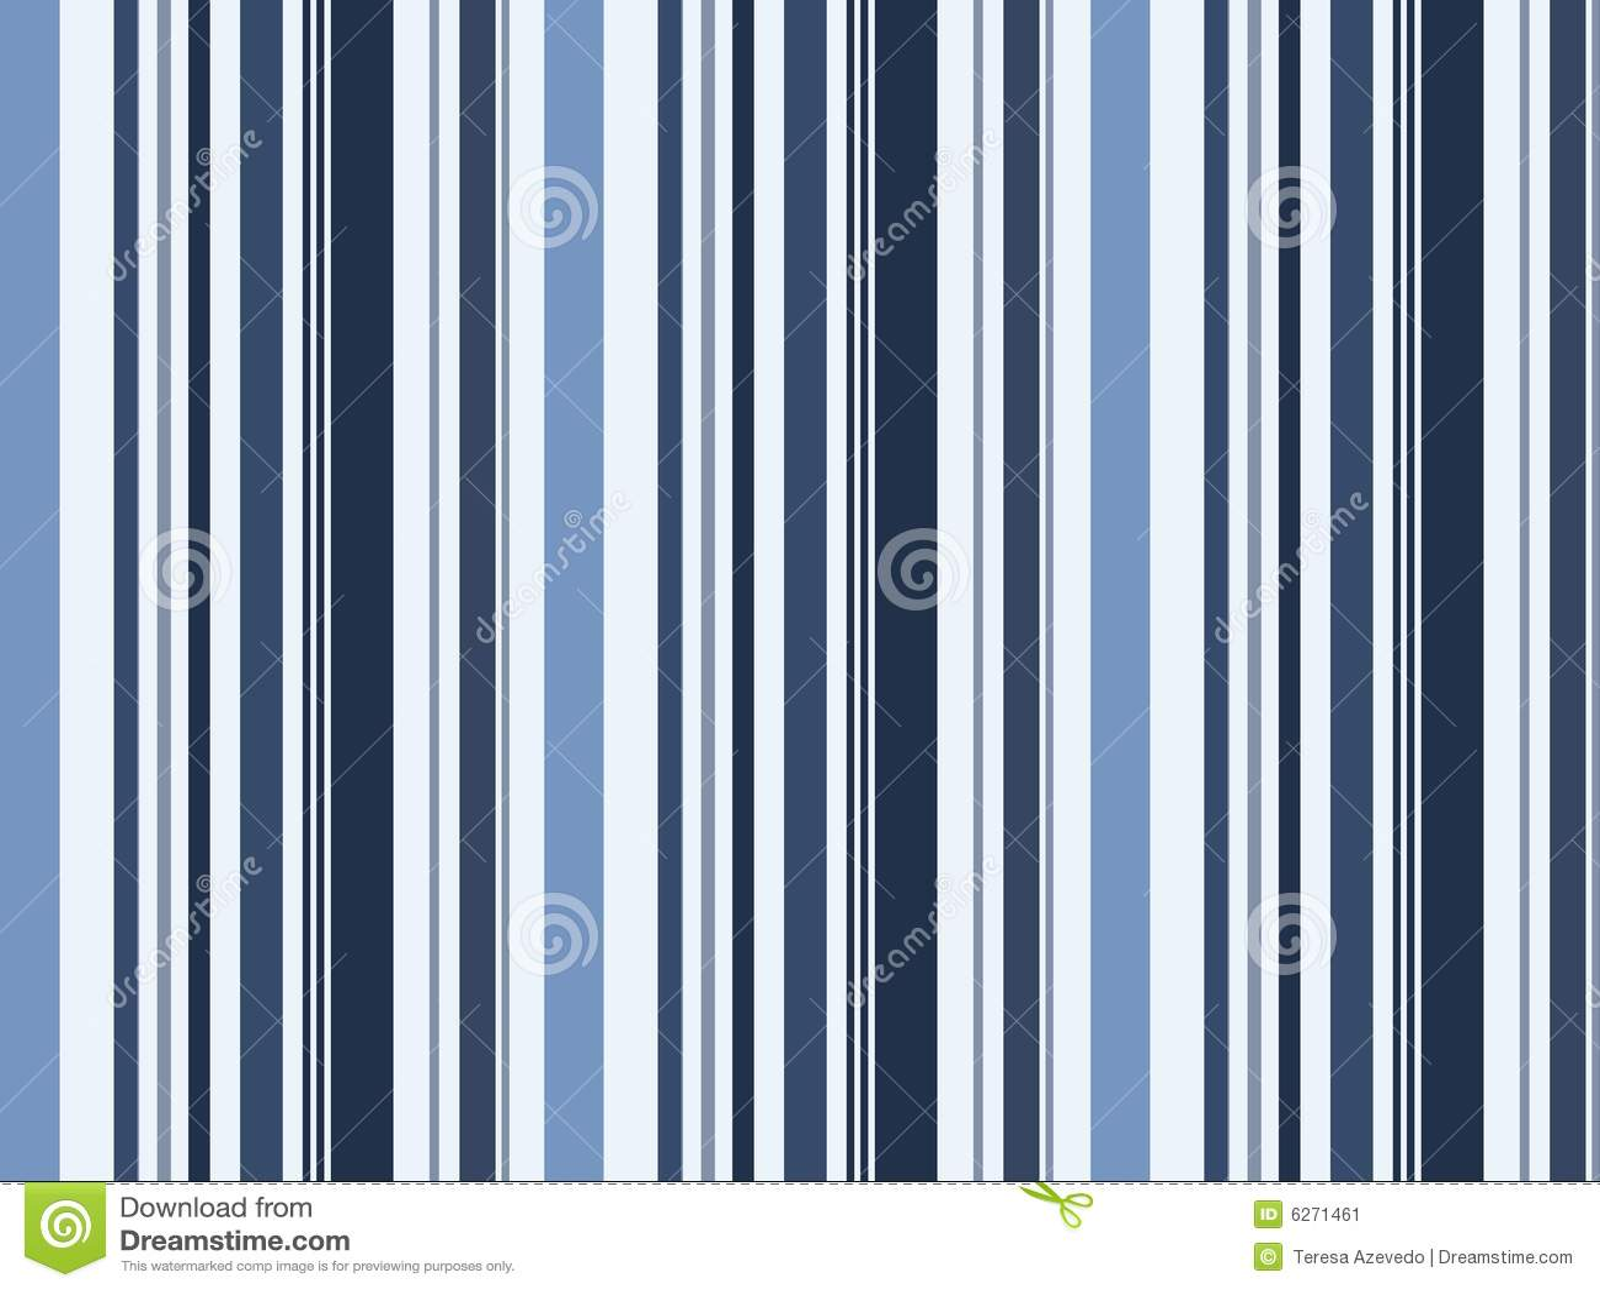 Azul E Marrom Po Kit Completo Molduras Para Convites Car Interior  #85A625 1300 1065